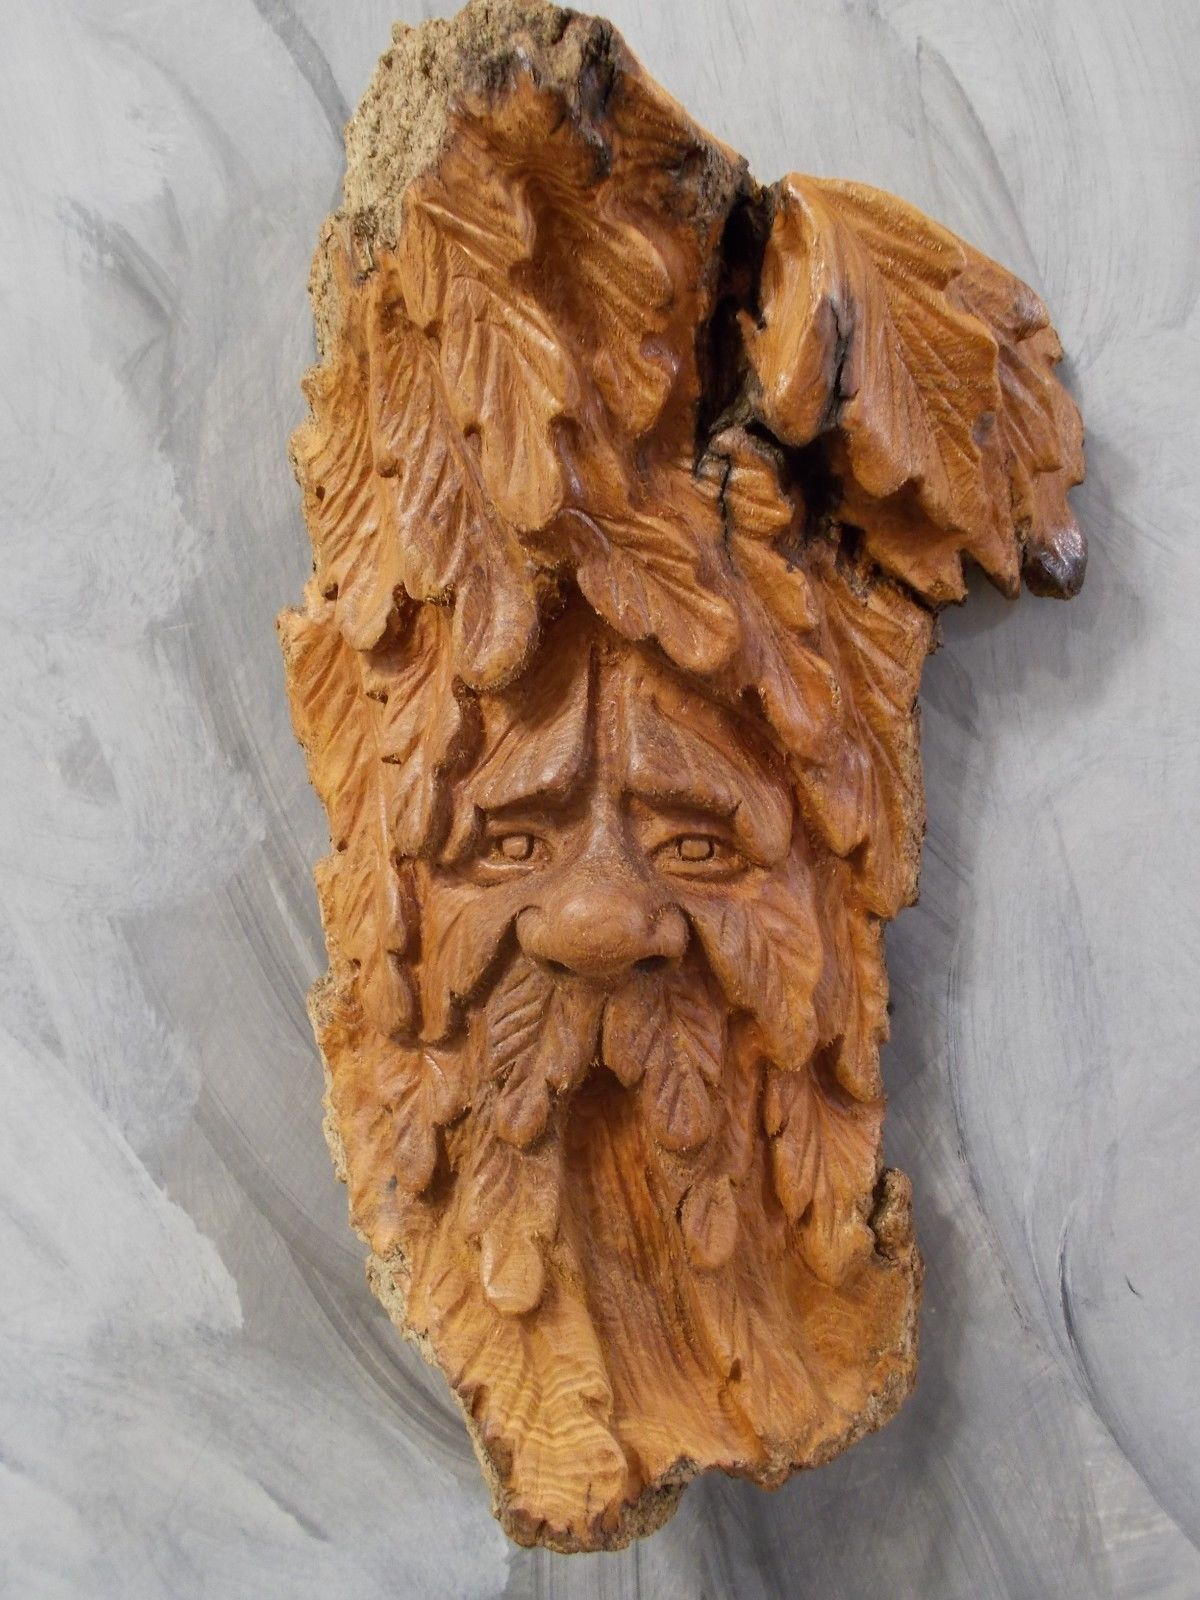 Knotty wood spirits greenman